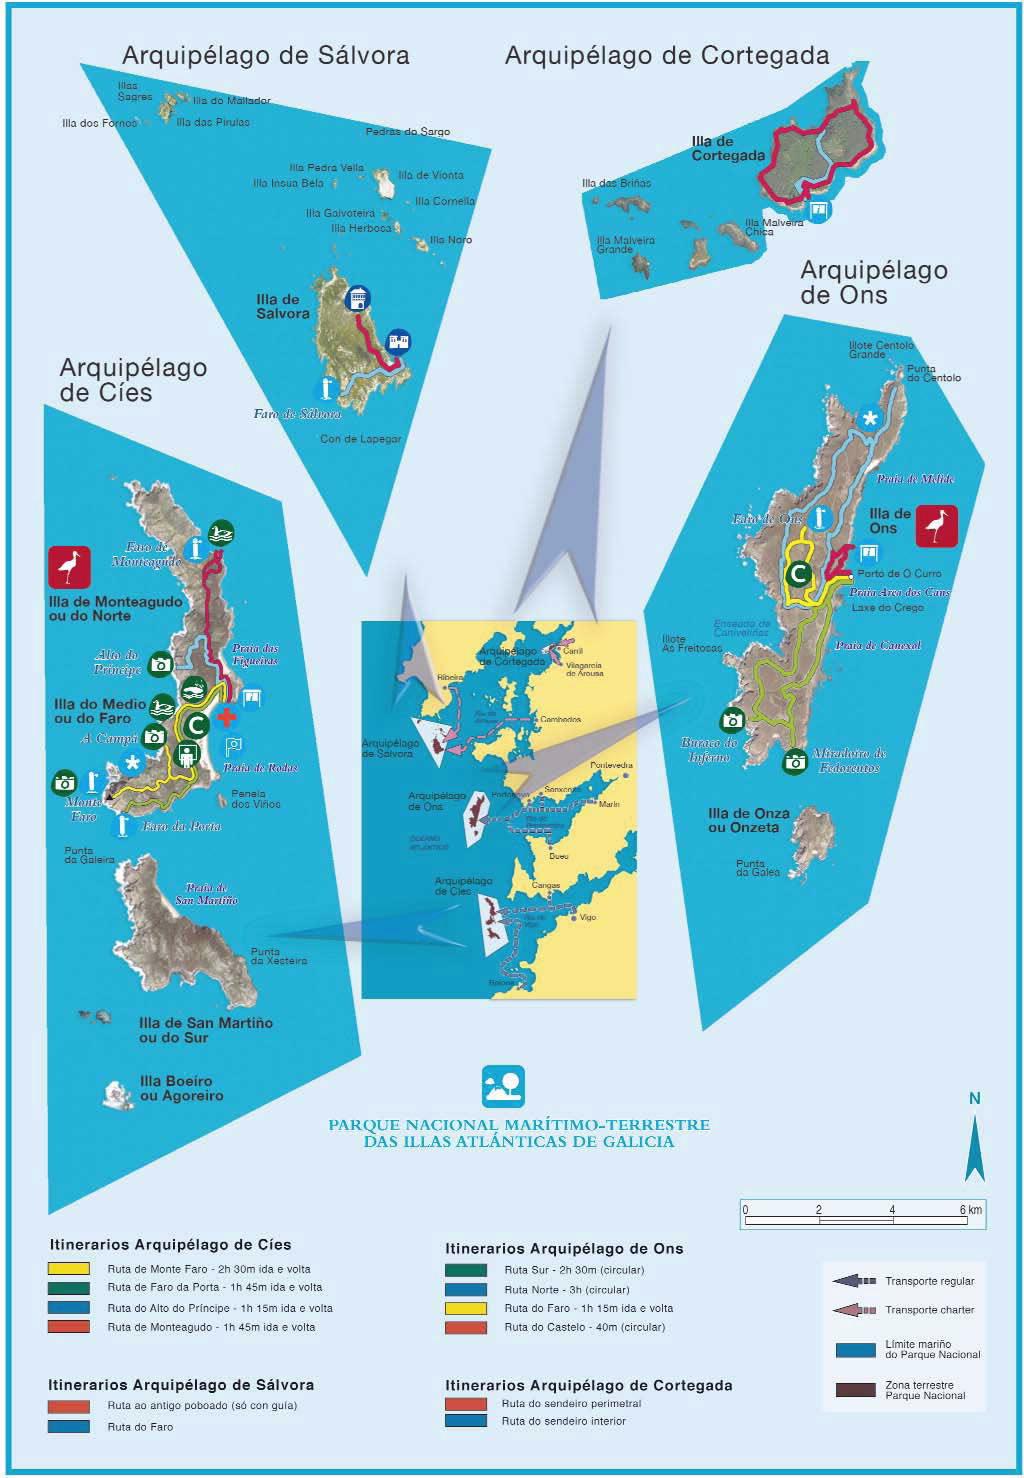 Isla De Ons Mapa.National Park Parque Nacional Maritimo Terrestre Das Illas